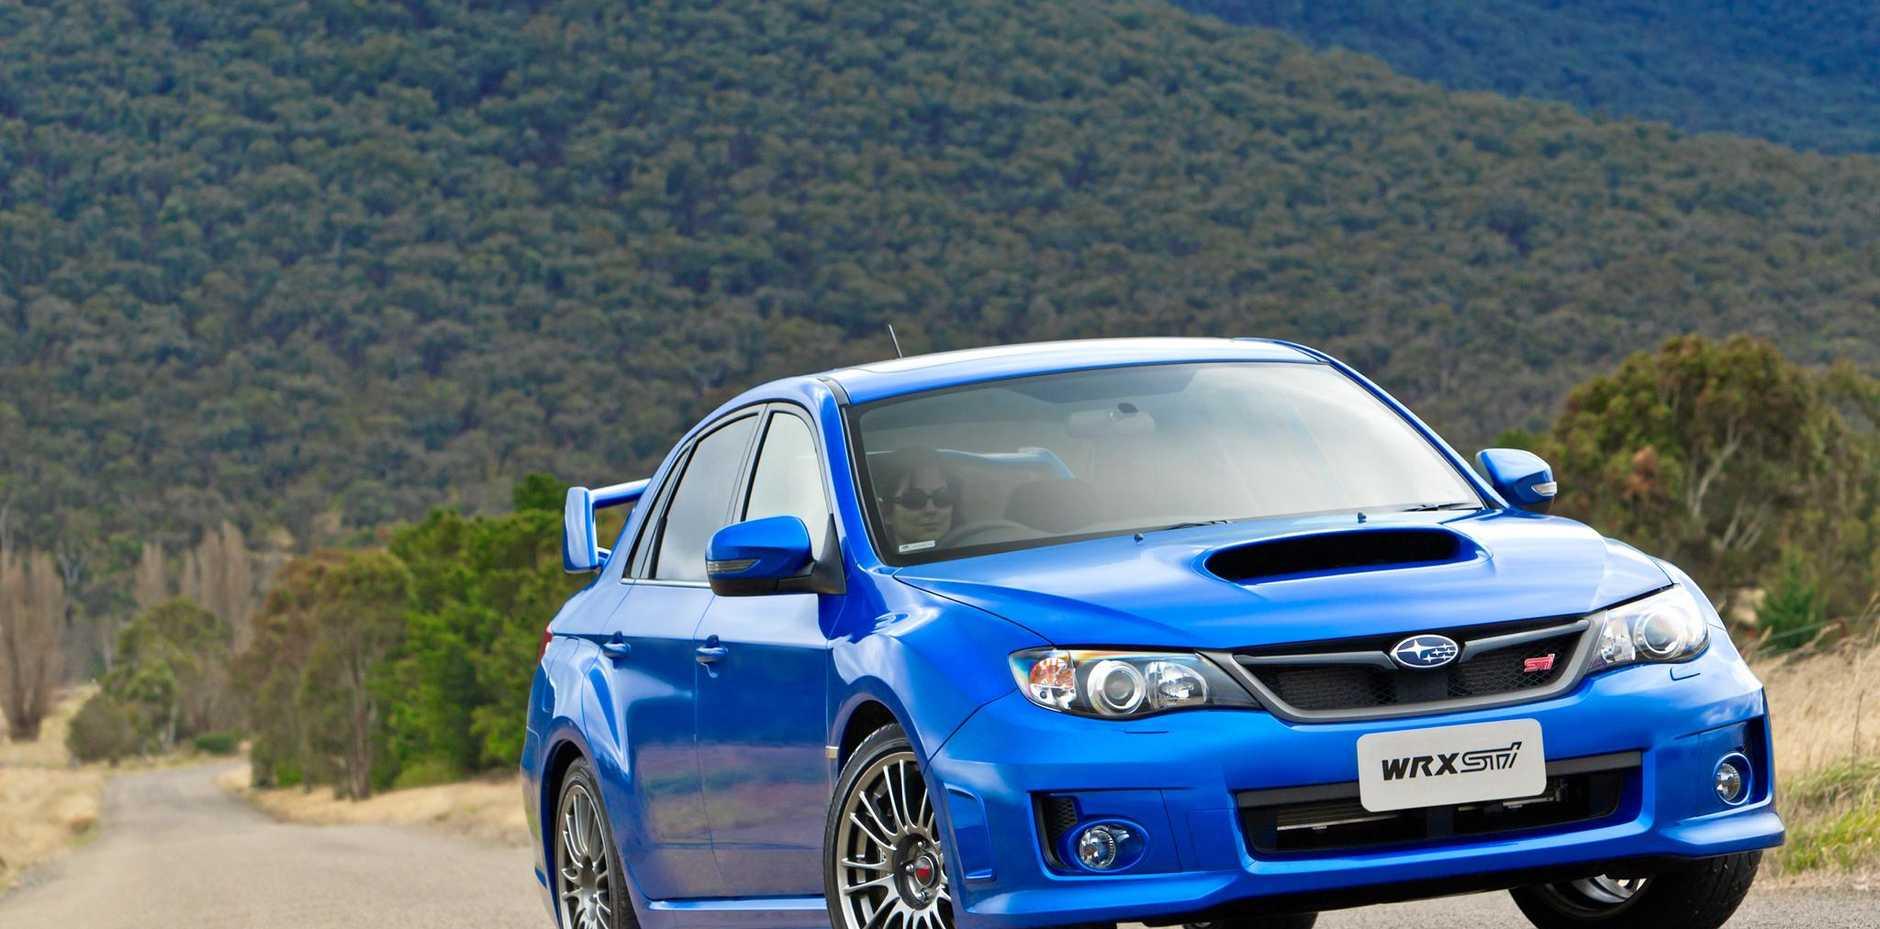 MY11 Subaru WRX STI Spec.R sedan front.